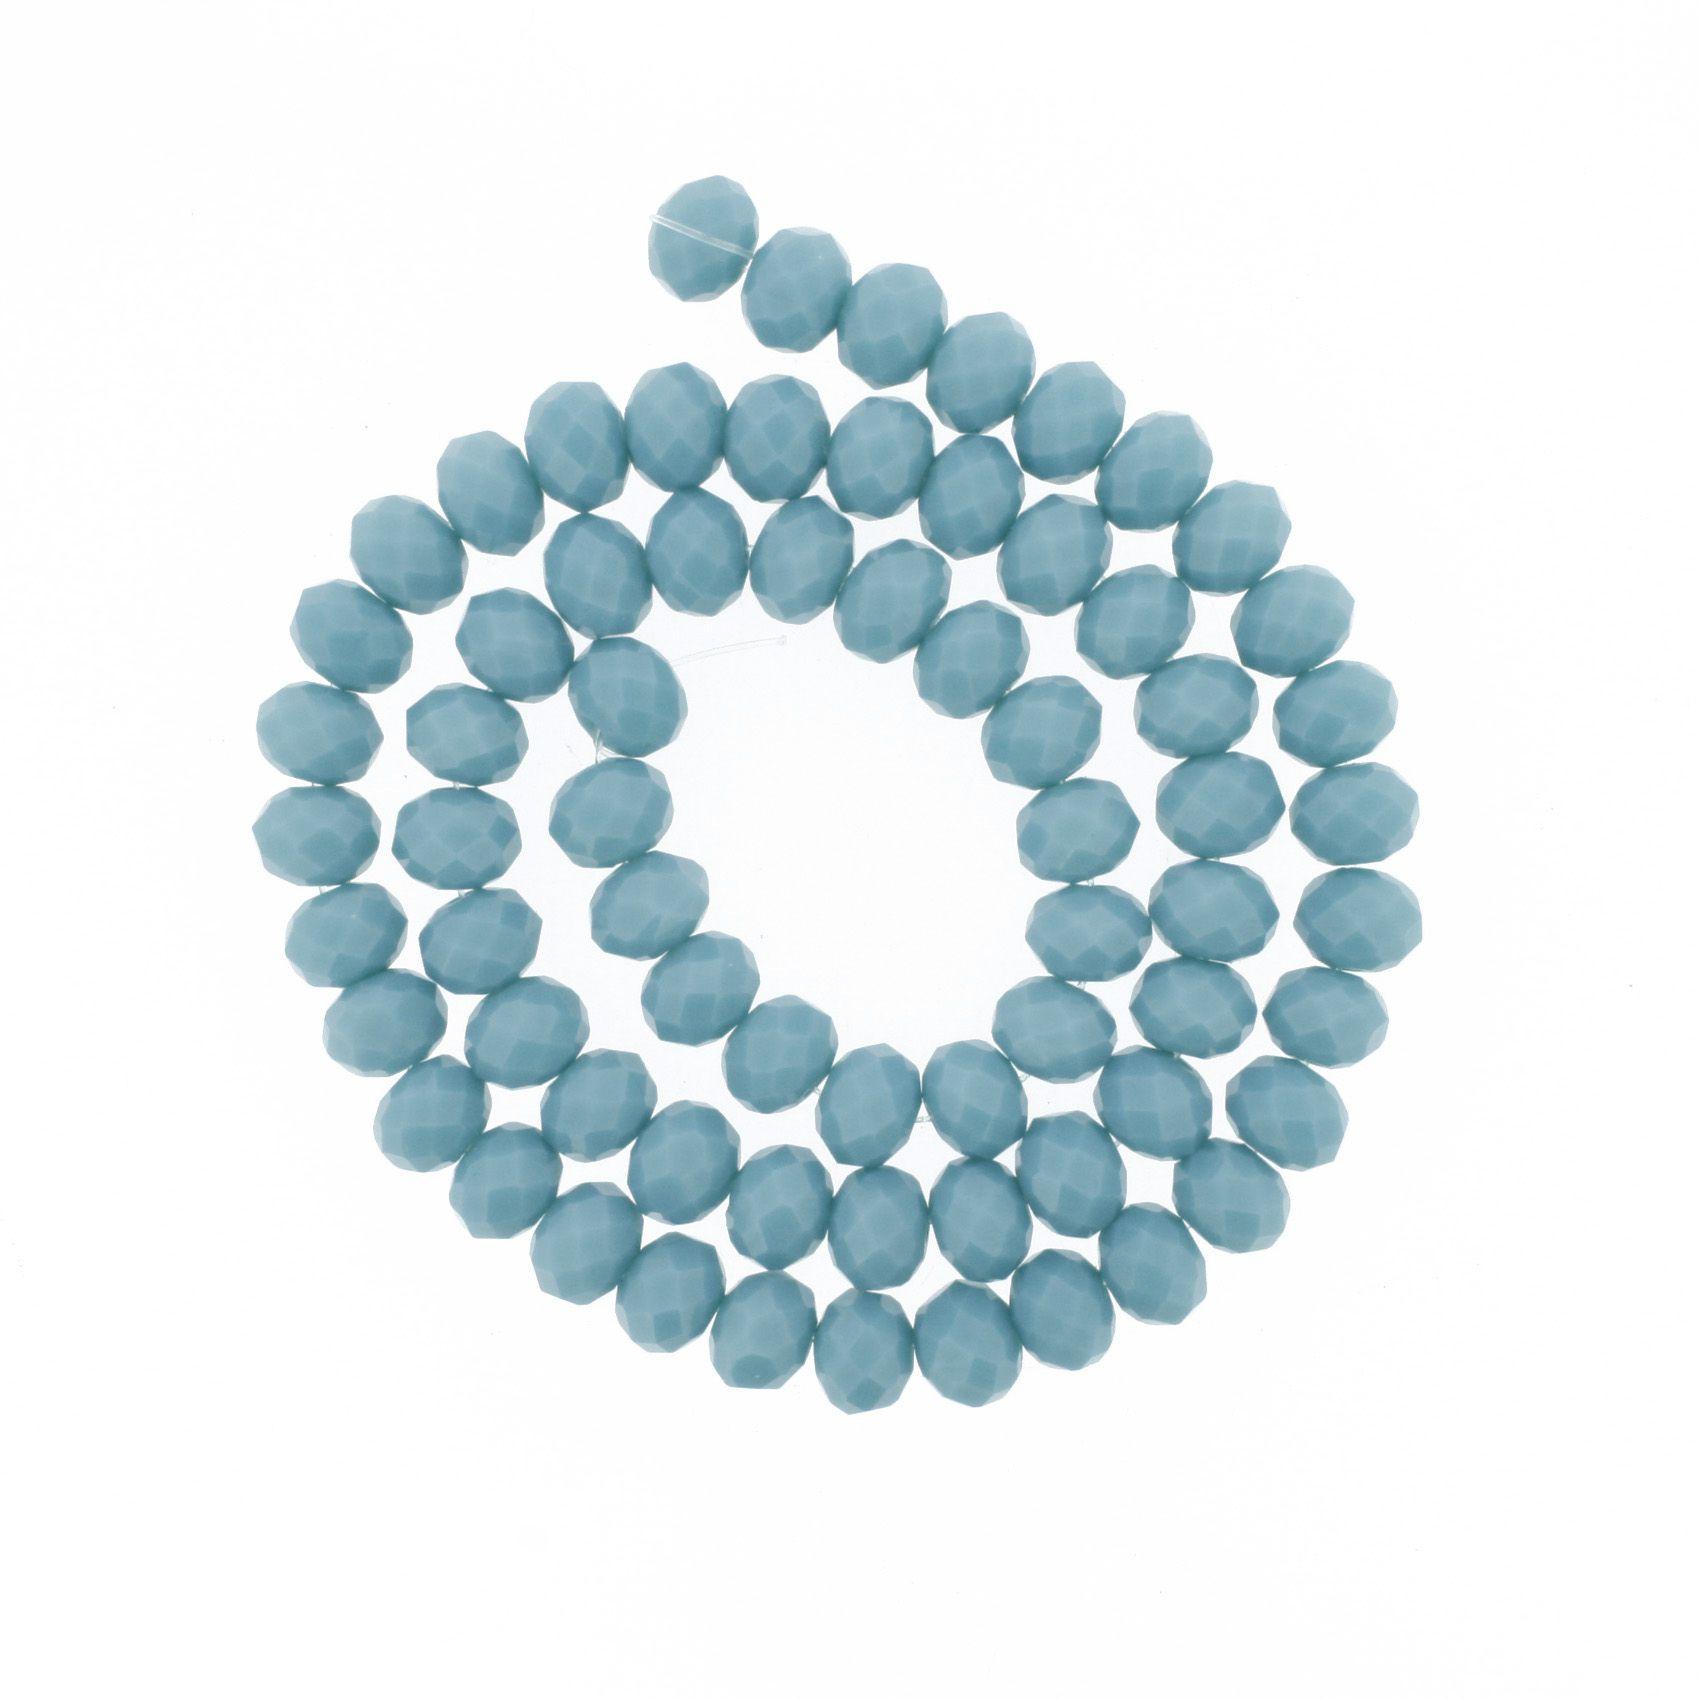 Fio de Cristal - Flat® - Azul Tiffany - 8mm  - Stéphanie Bijoux® - Peças para Bijuterias e Artesanato